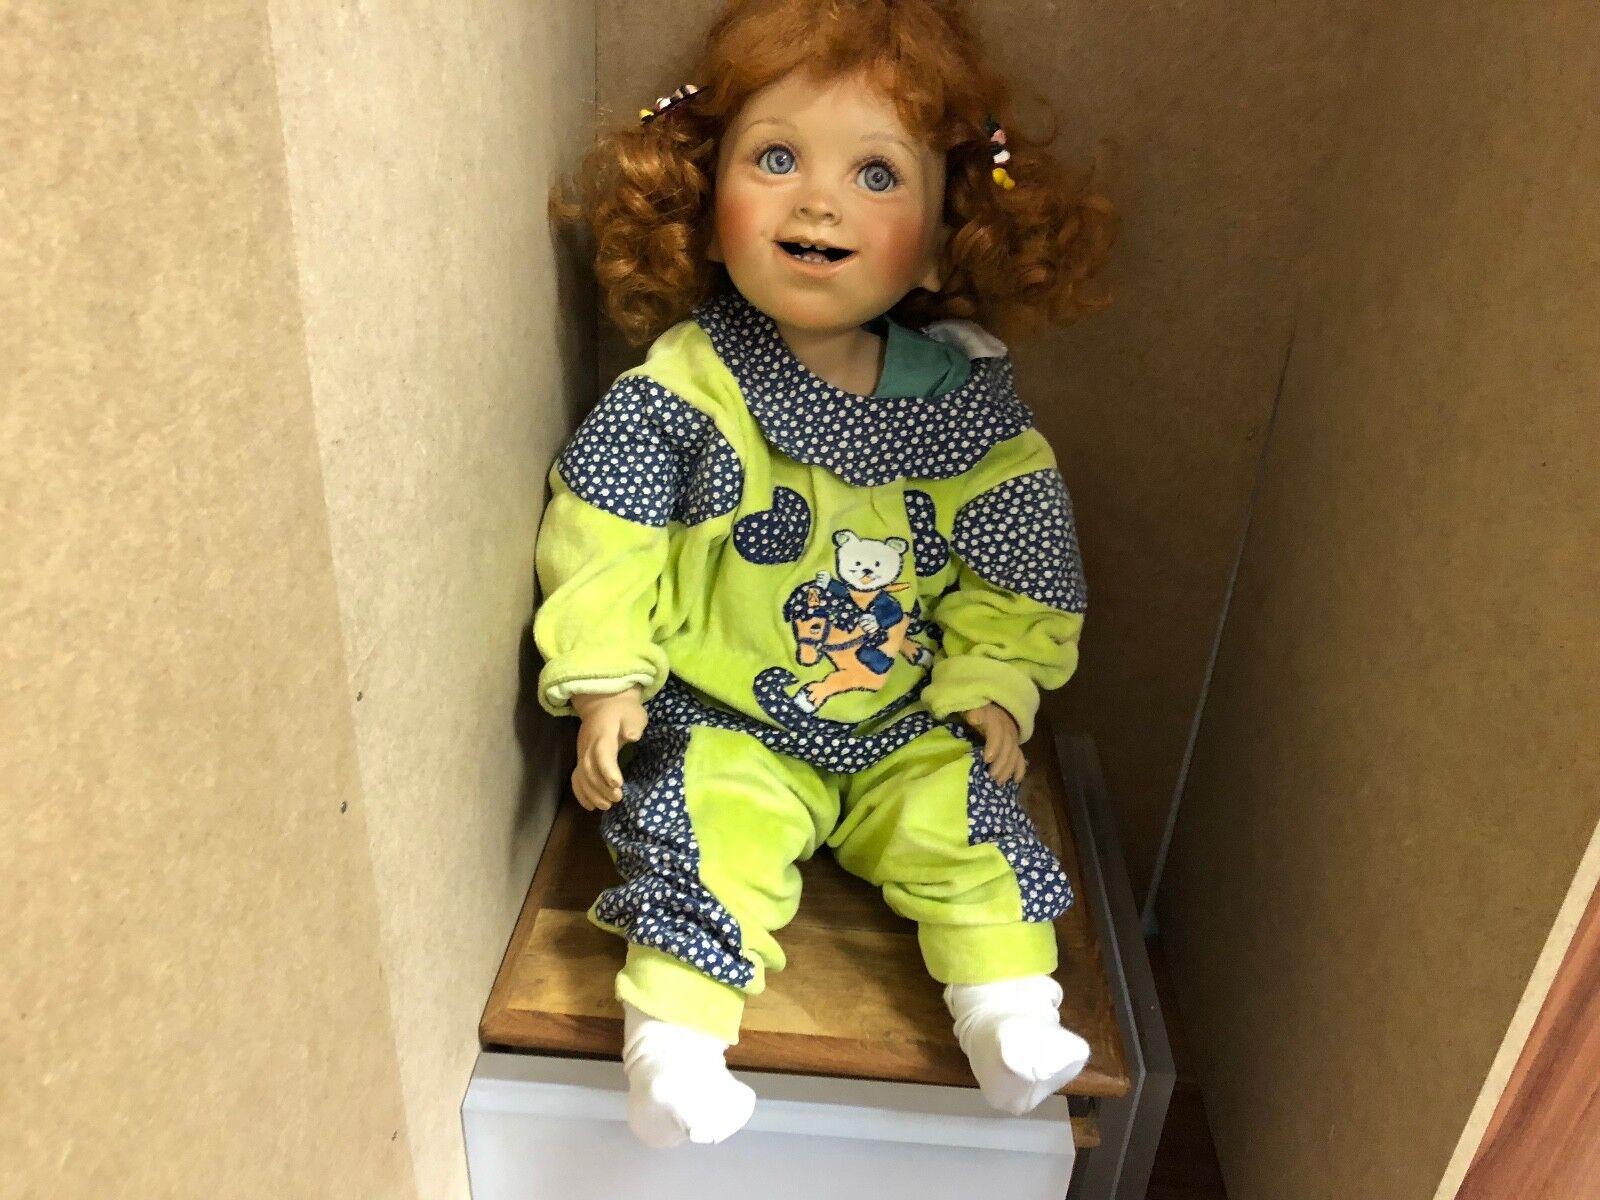 Artistas muñeca muñeca de porcelana 64 cm. top estado.